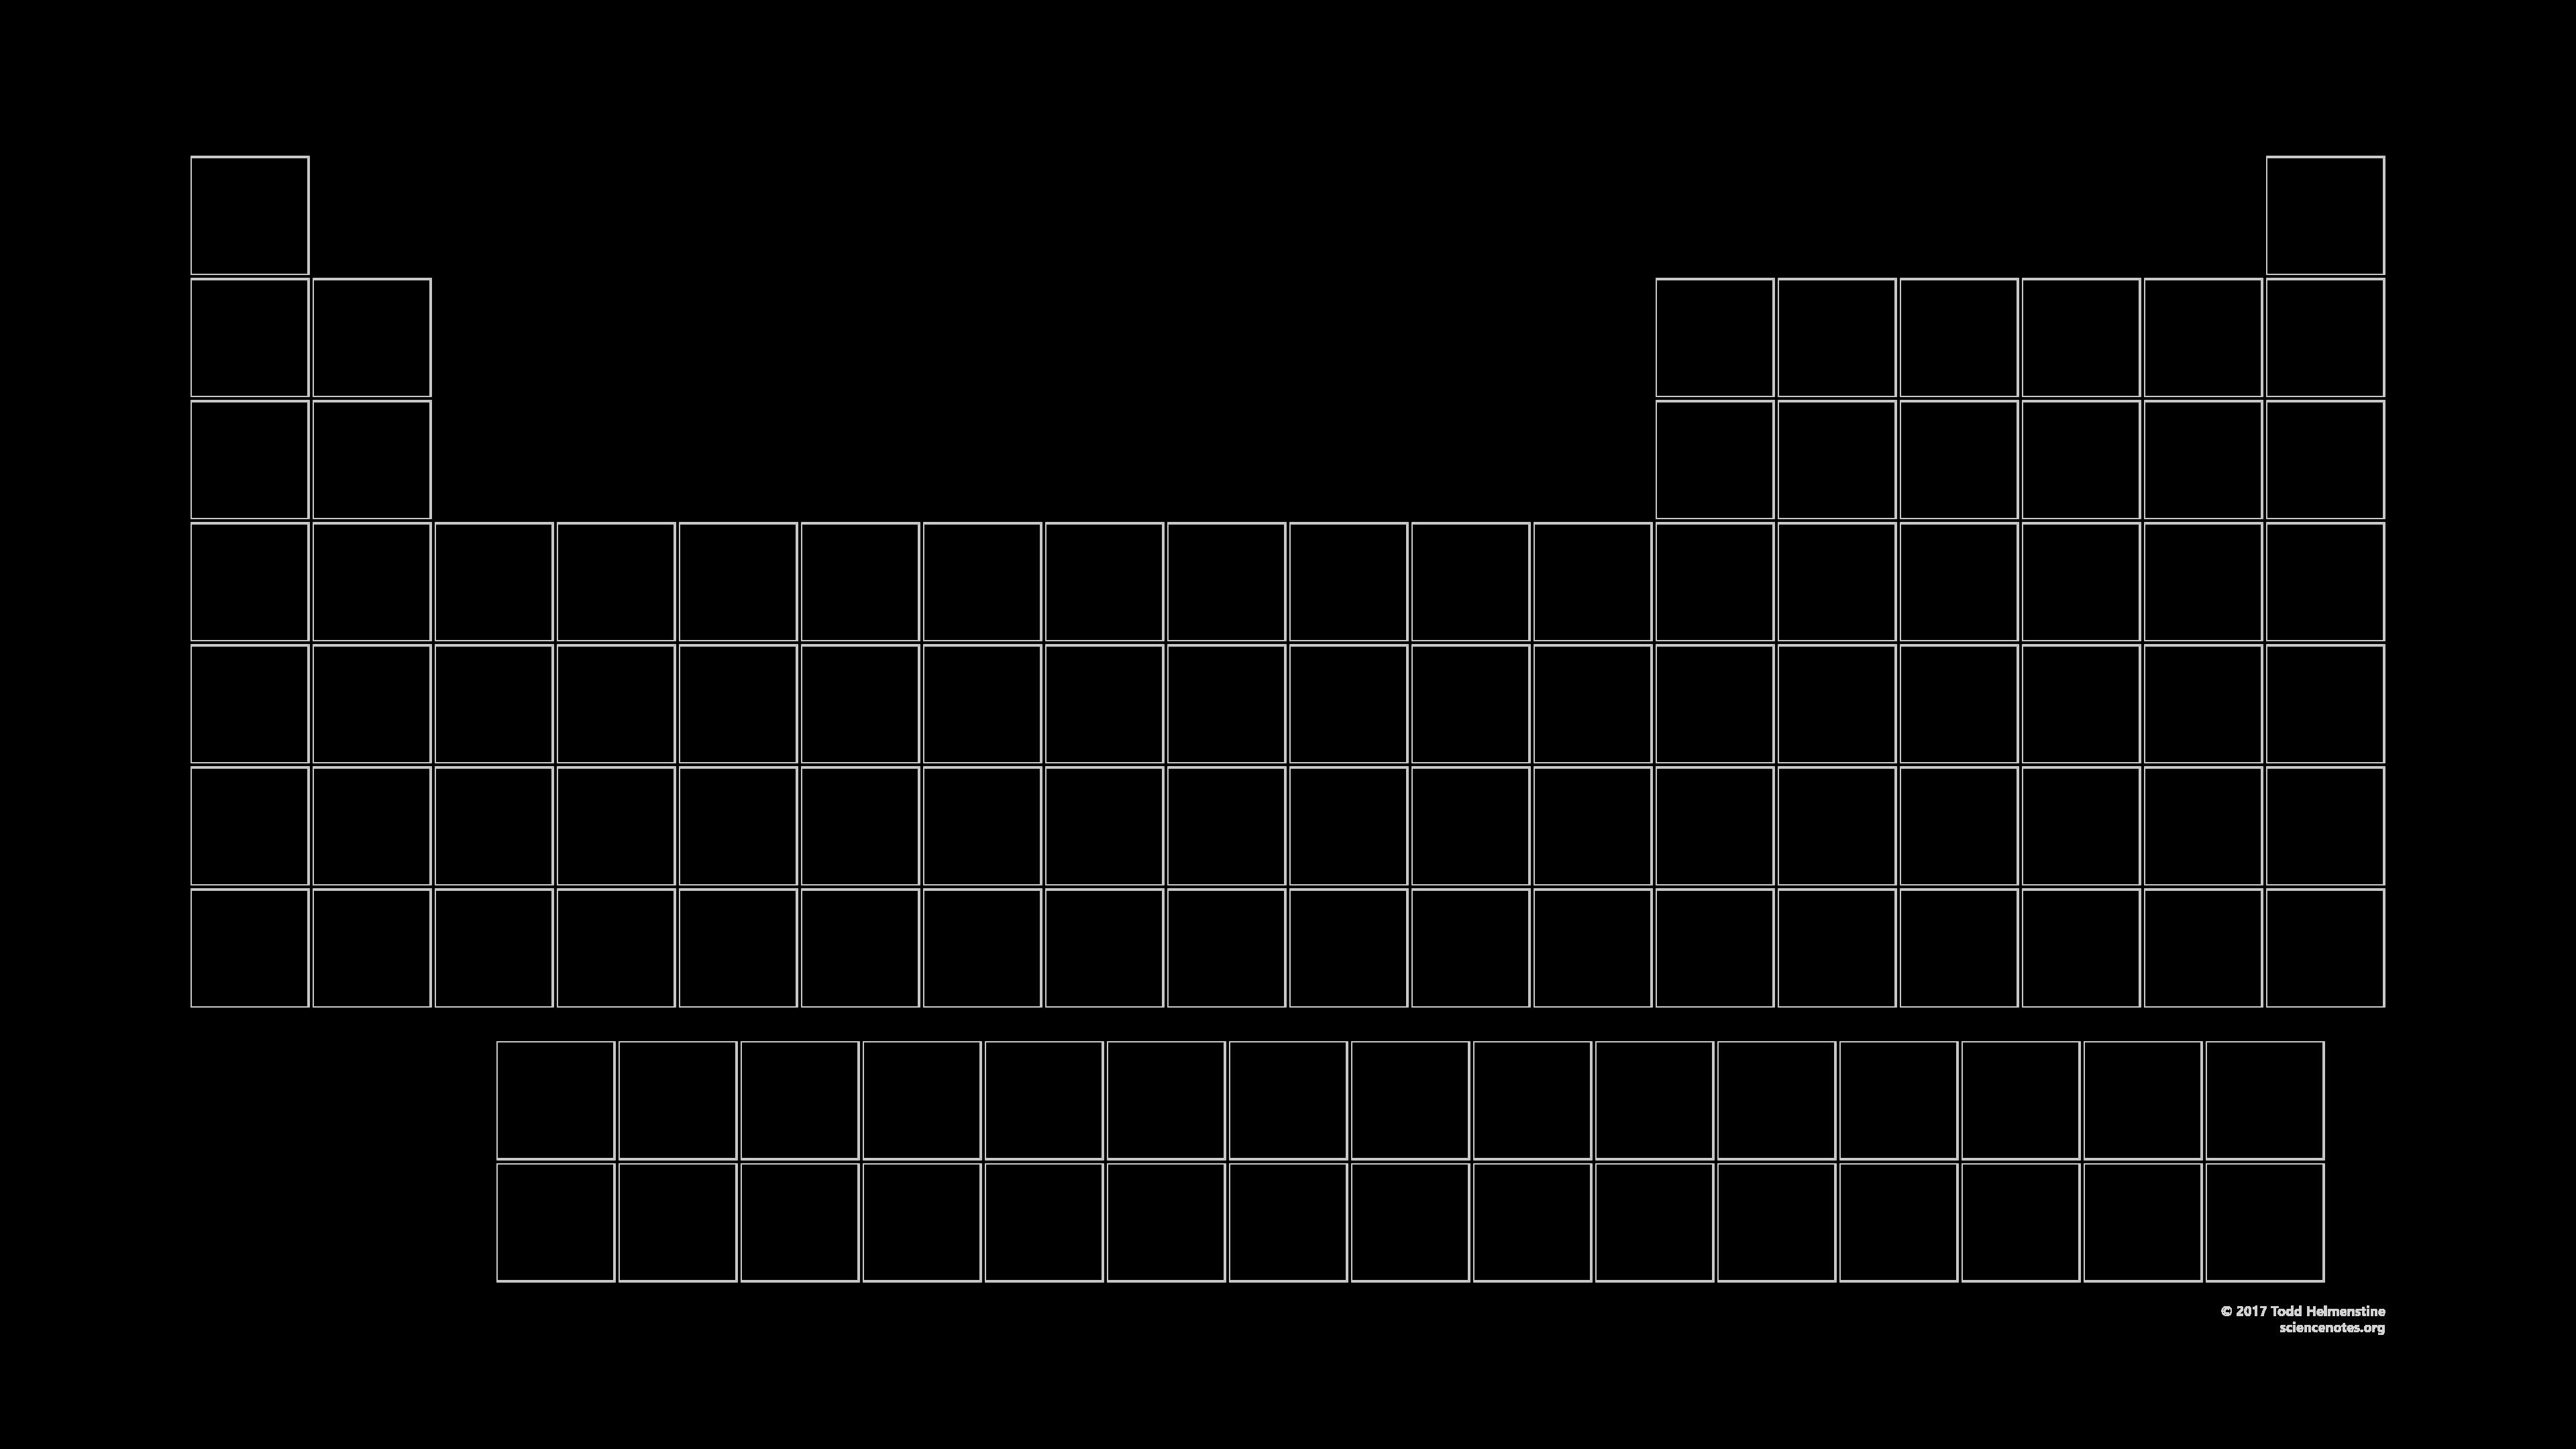 Printable Periodic Table Black and White